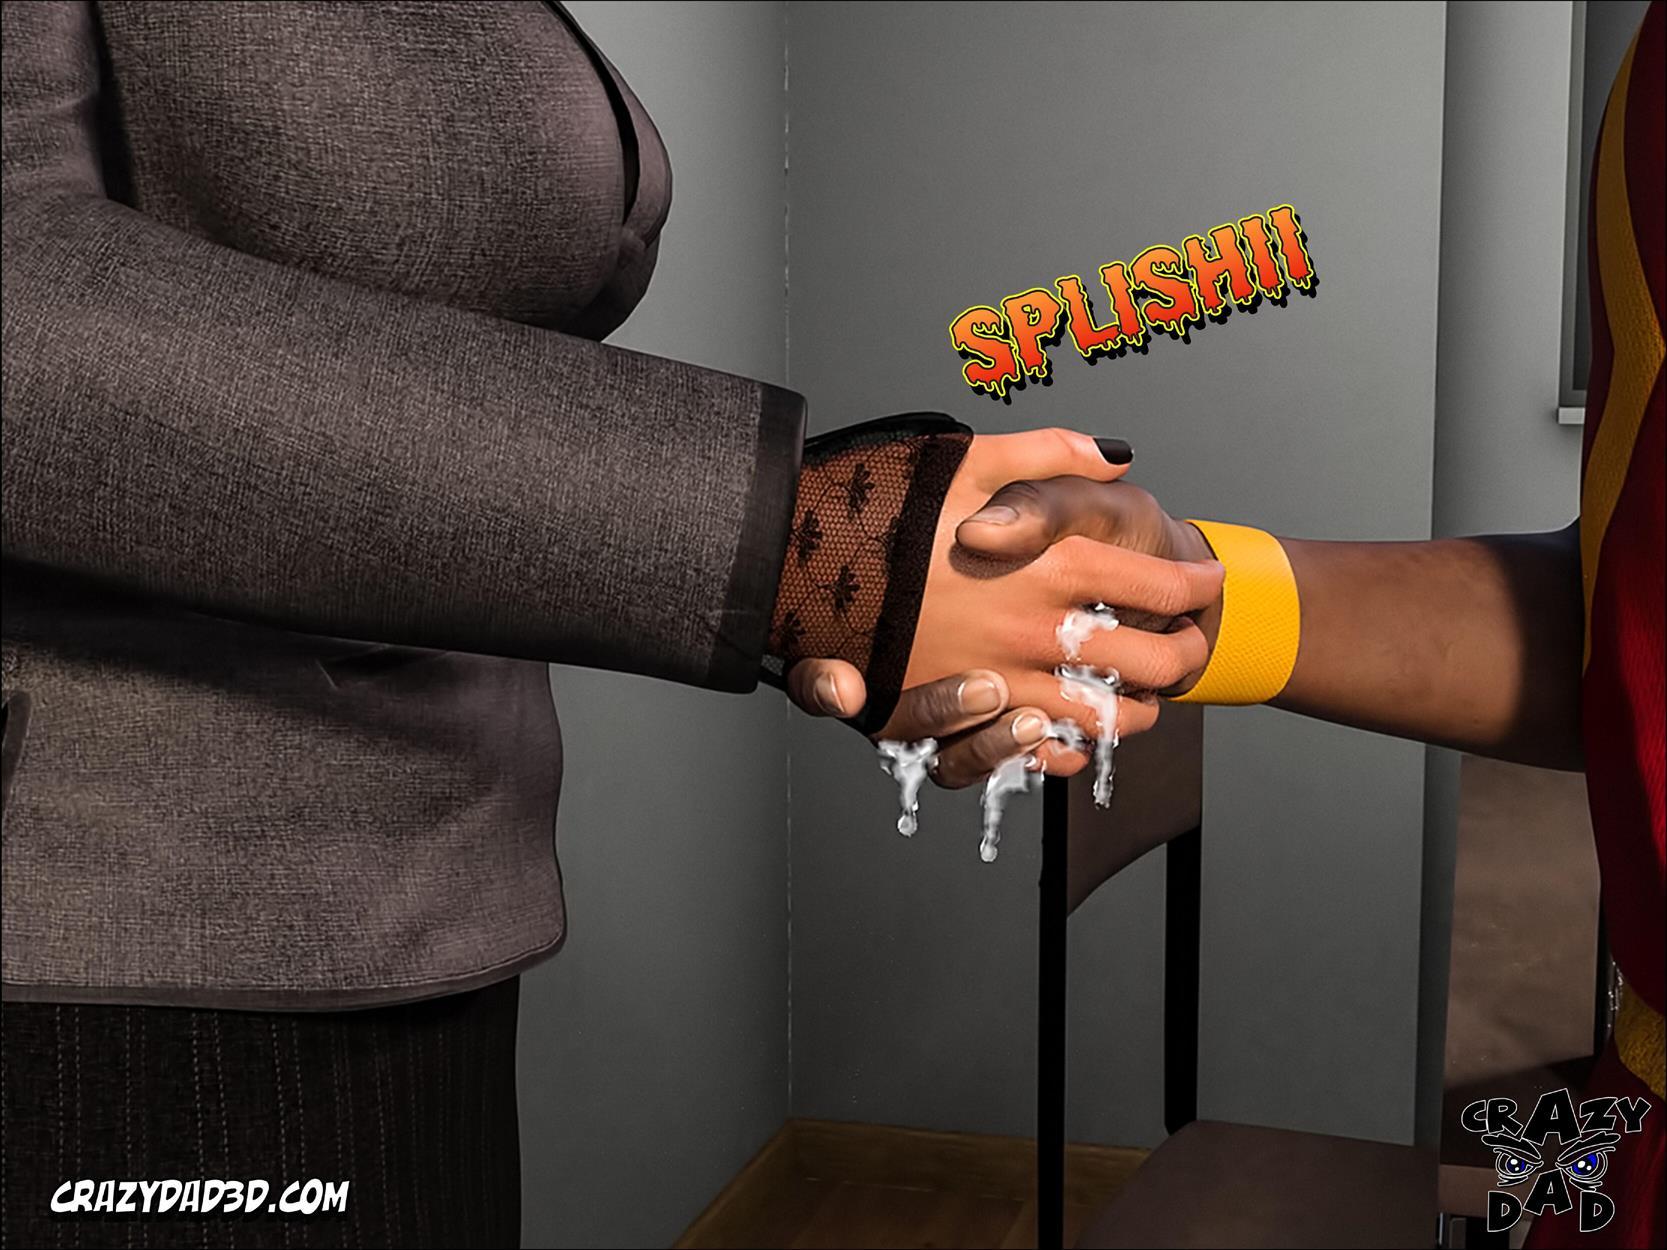 Spank 2 -Teacher Marilia [Crazy Dad 3D] - Foto 37